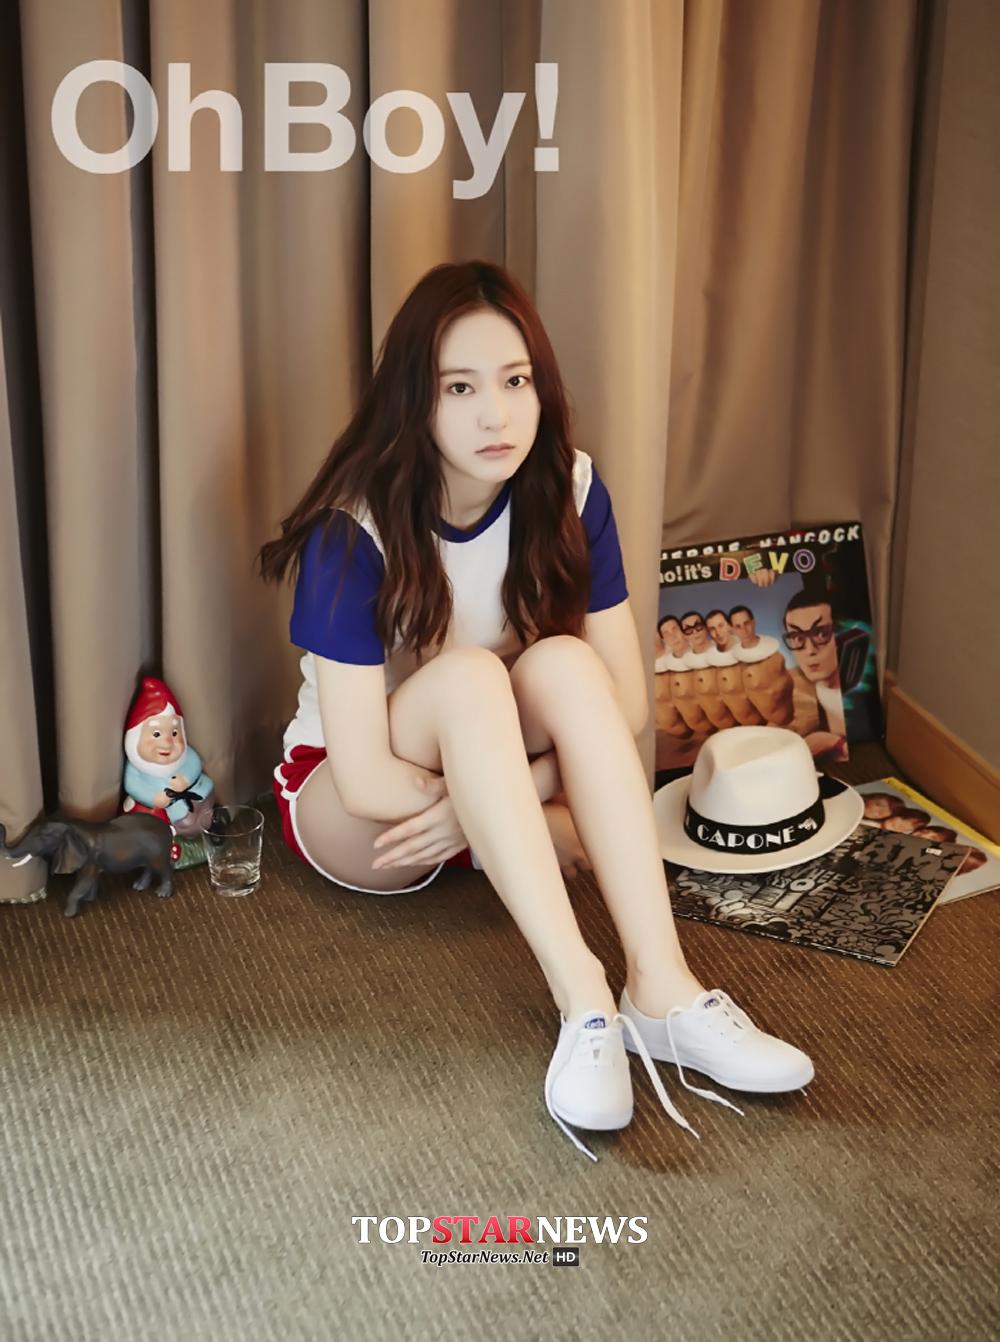 Krystal回歸一般二十多歲女生的生活模式,將日常簡單的休閒鞋穿搭穿出自然風格